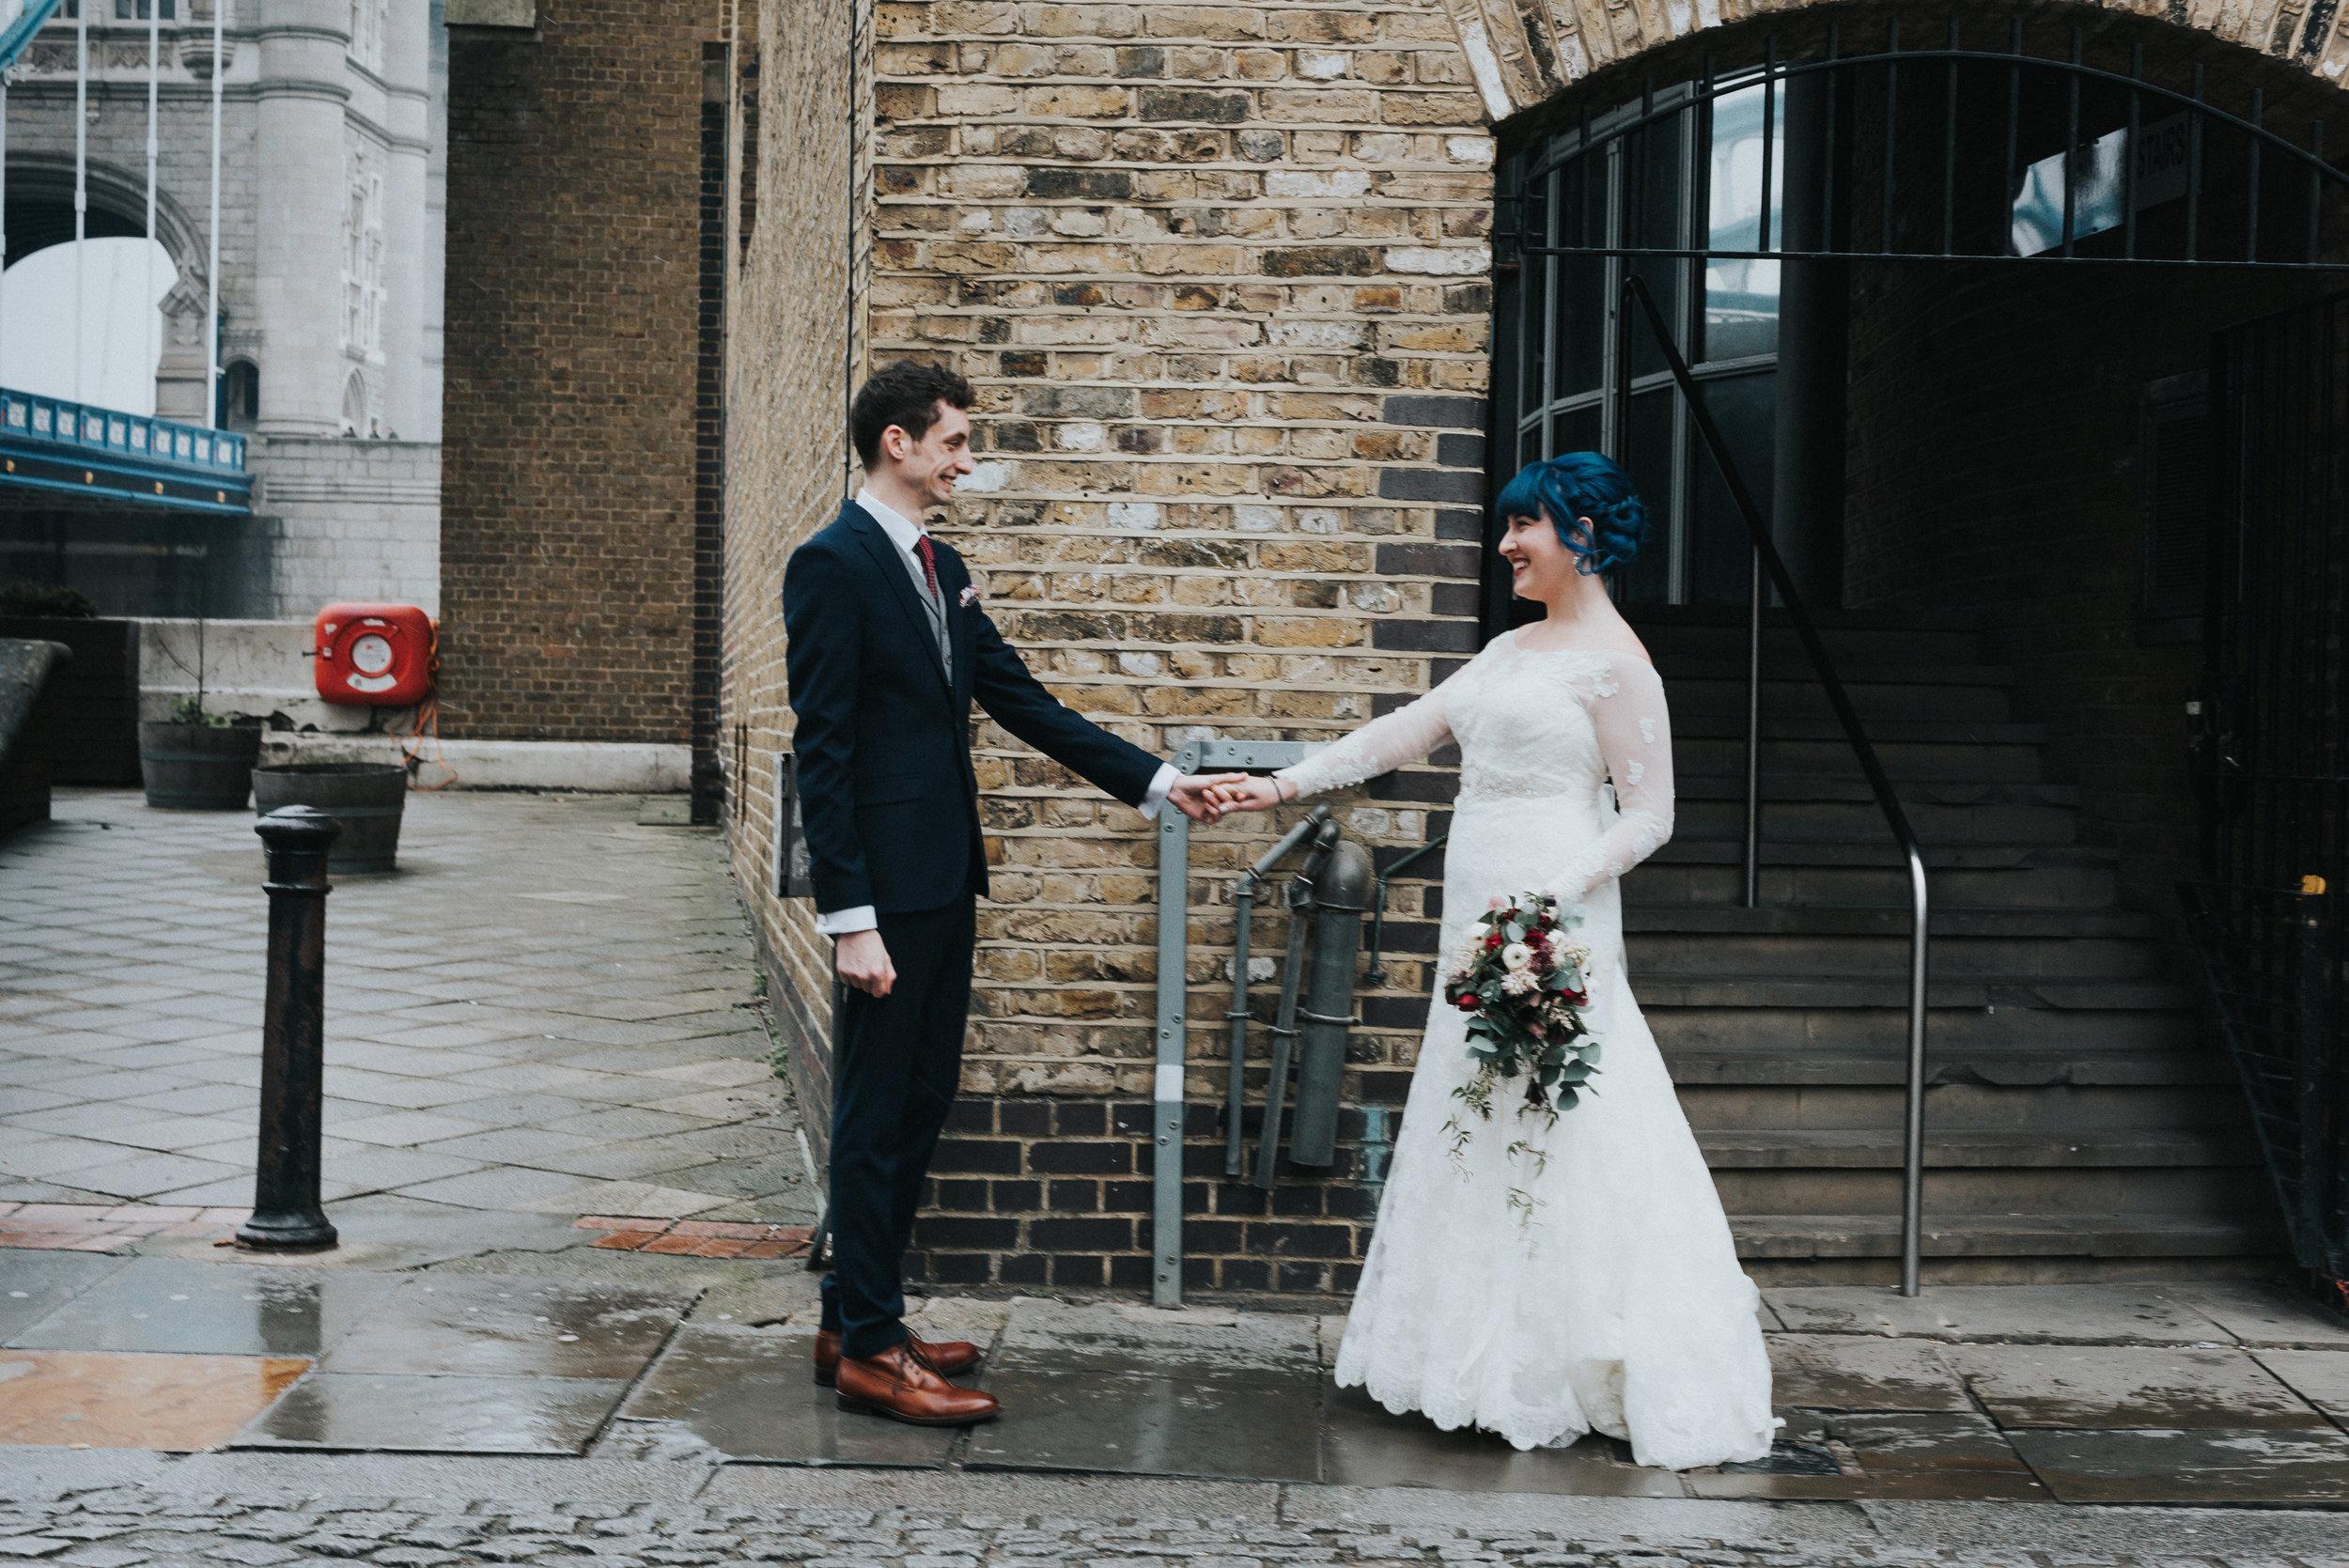 London-Chic-Alternative-Wedding-Jay-Tunbridge-Photographic-Co-7.jpg